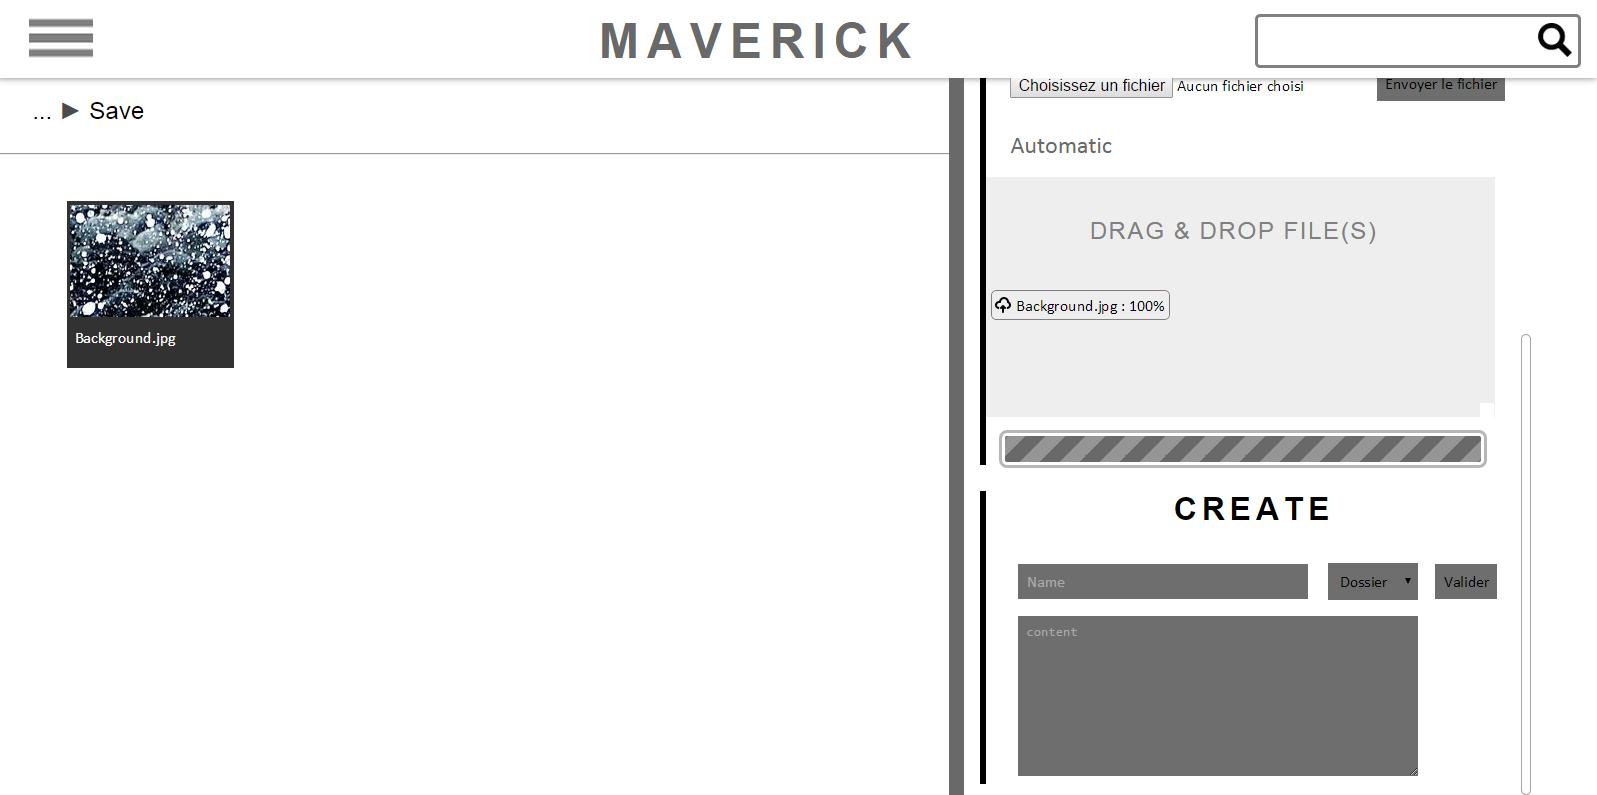 Maverick - Cloud storage website - 2